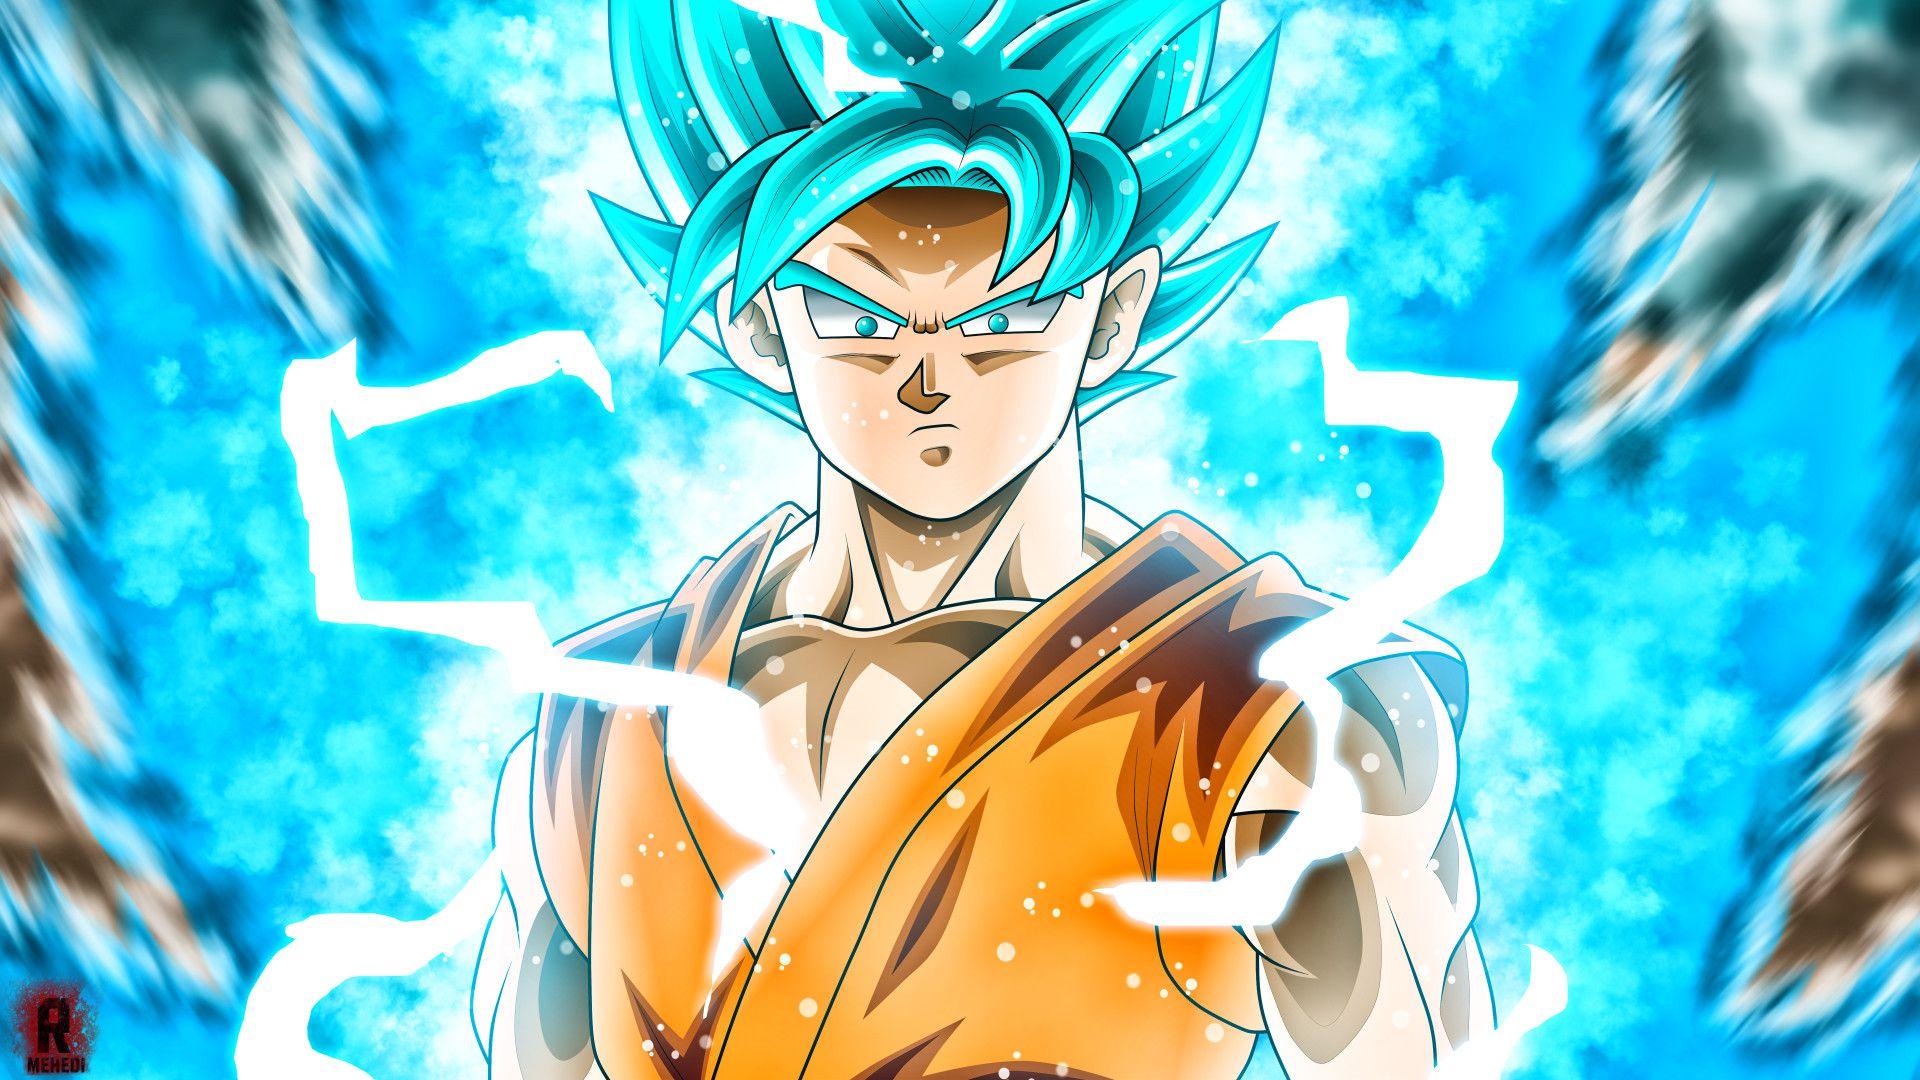 Super Saiyan God Hd Wallpaper 71 Images Goku Super Saiyan Blue Goku Super Saiyan Wallpapers Dragon Ball Super Wallpapers